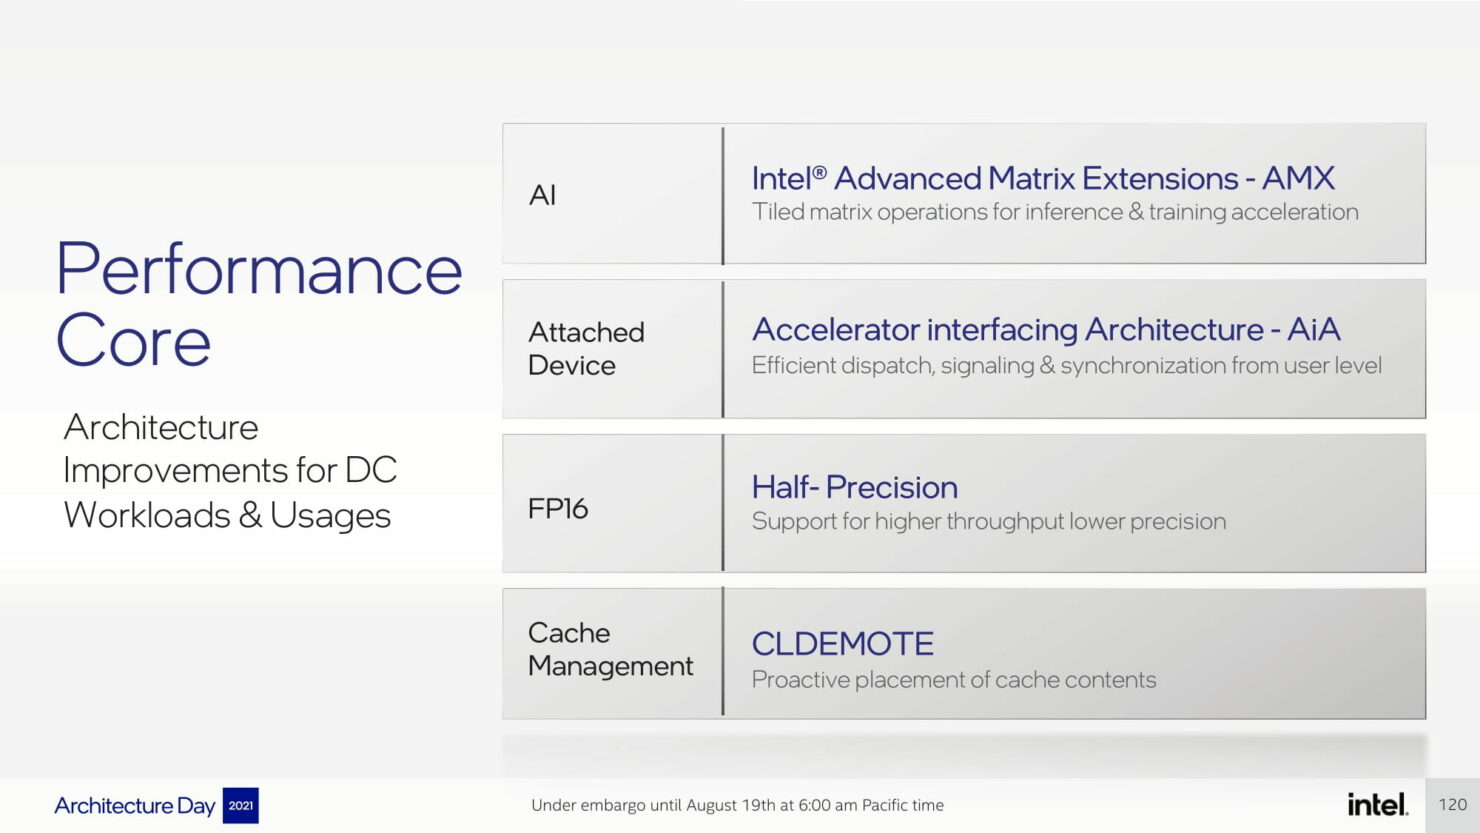 intel-architecture-day-2021_pressdeck_final_embargo-compressed-120